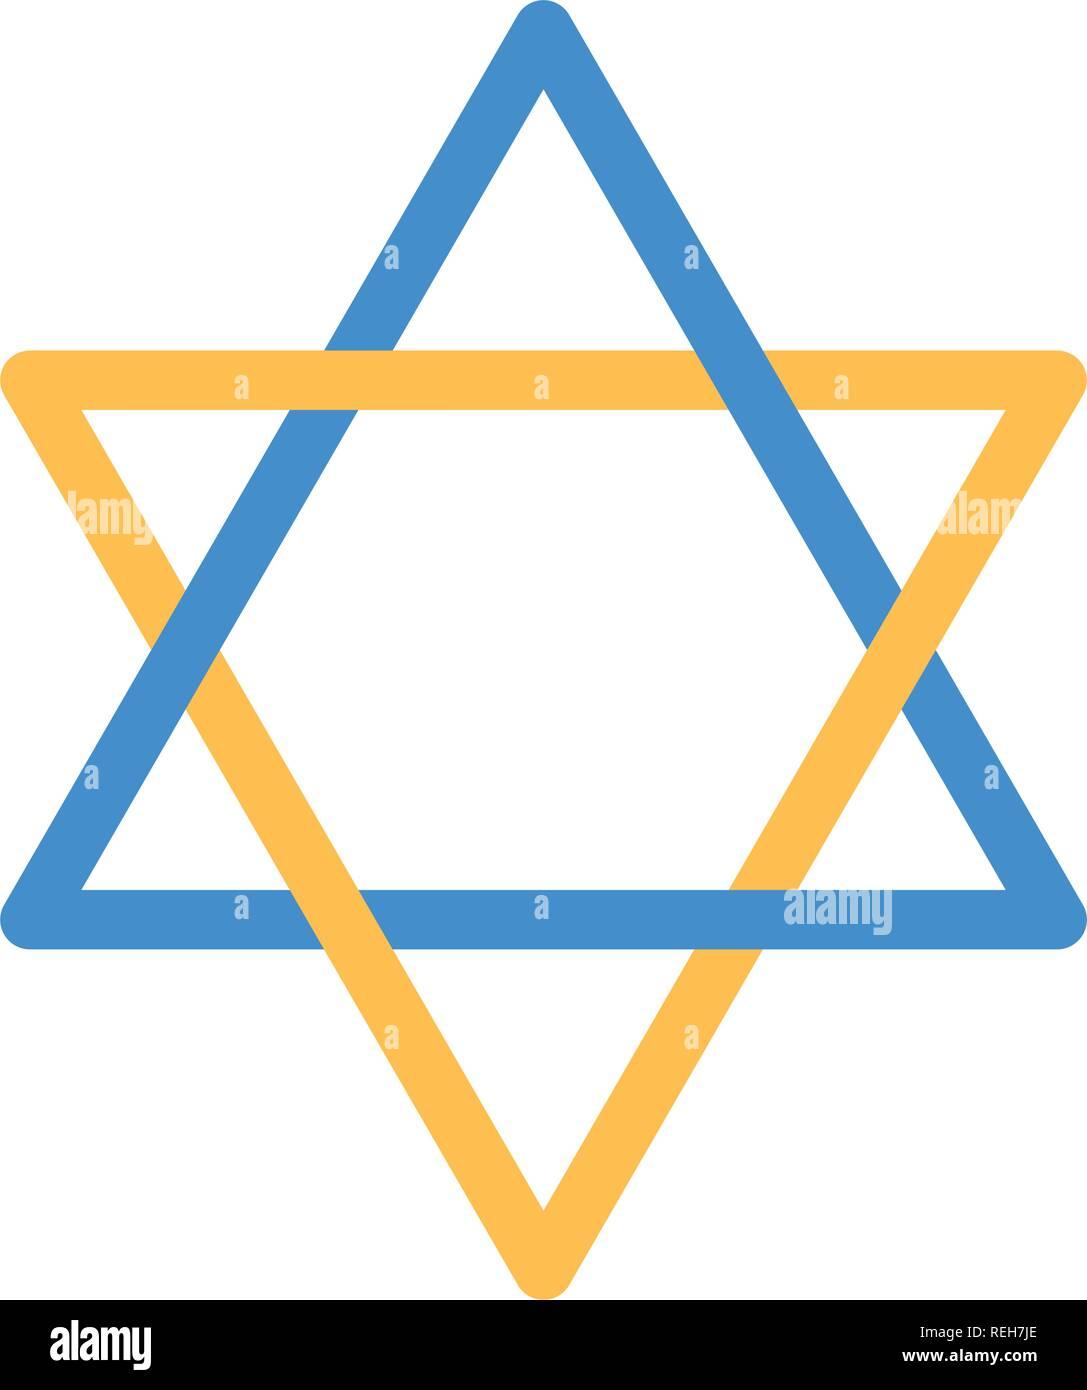 David star emblem - Stock Image